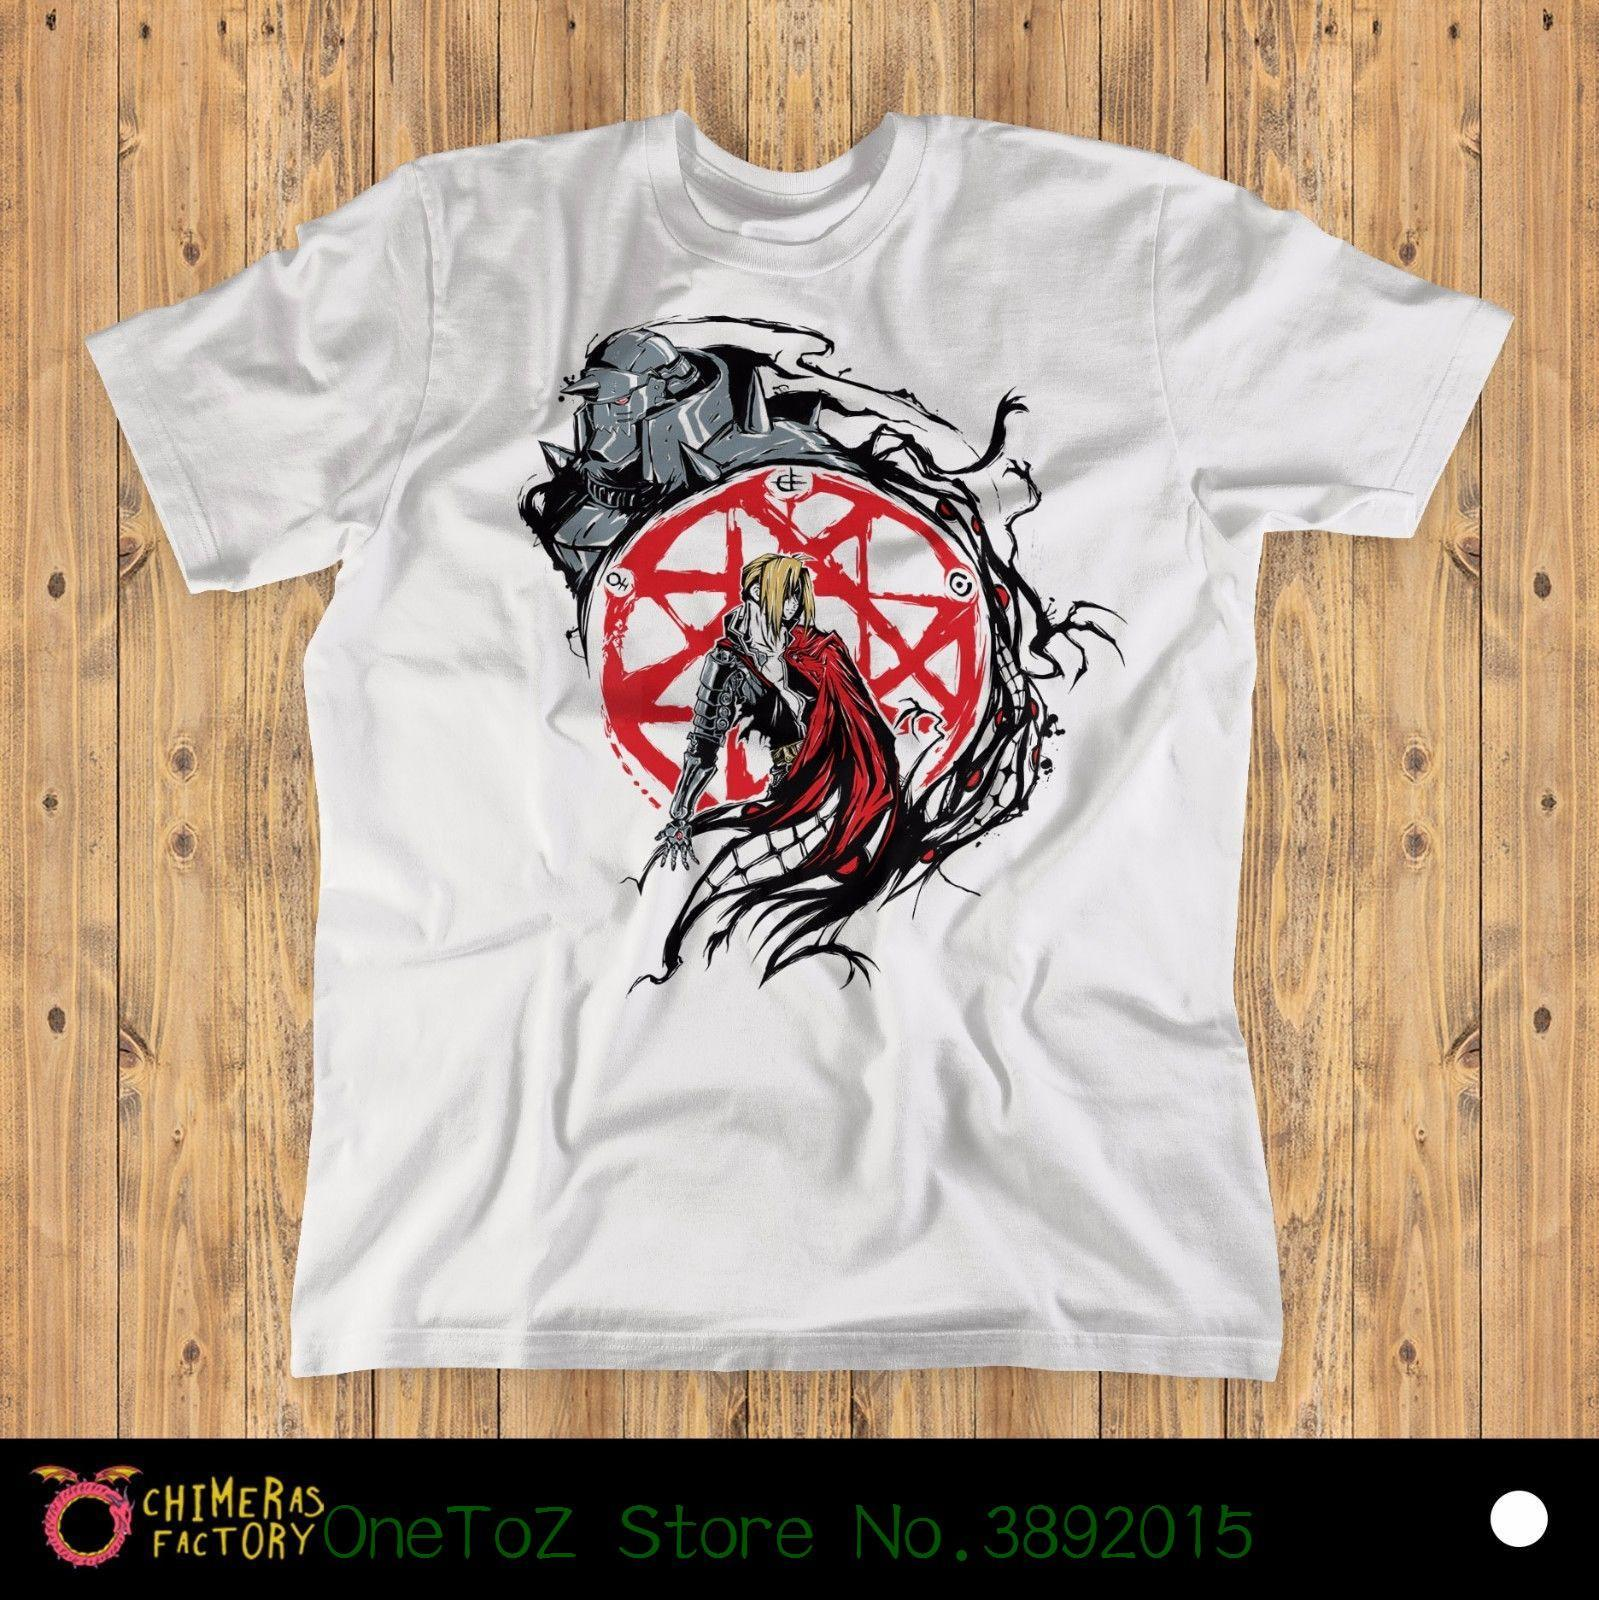 54c79ed6 Compre Top Harajuku Camiseta De Manga Curta Fullmetal Circle Unisex T Shirt  | Fullmetal Alchemist, Anime, Manga De Jie032, $14.67 | Pt.Dhgate.Com